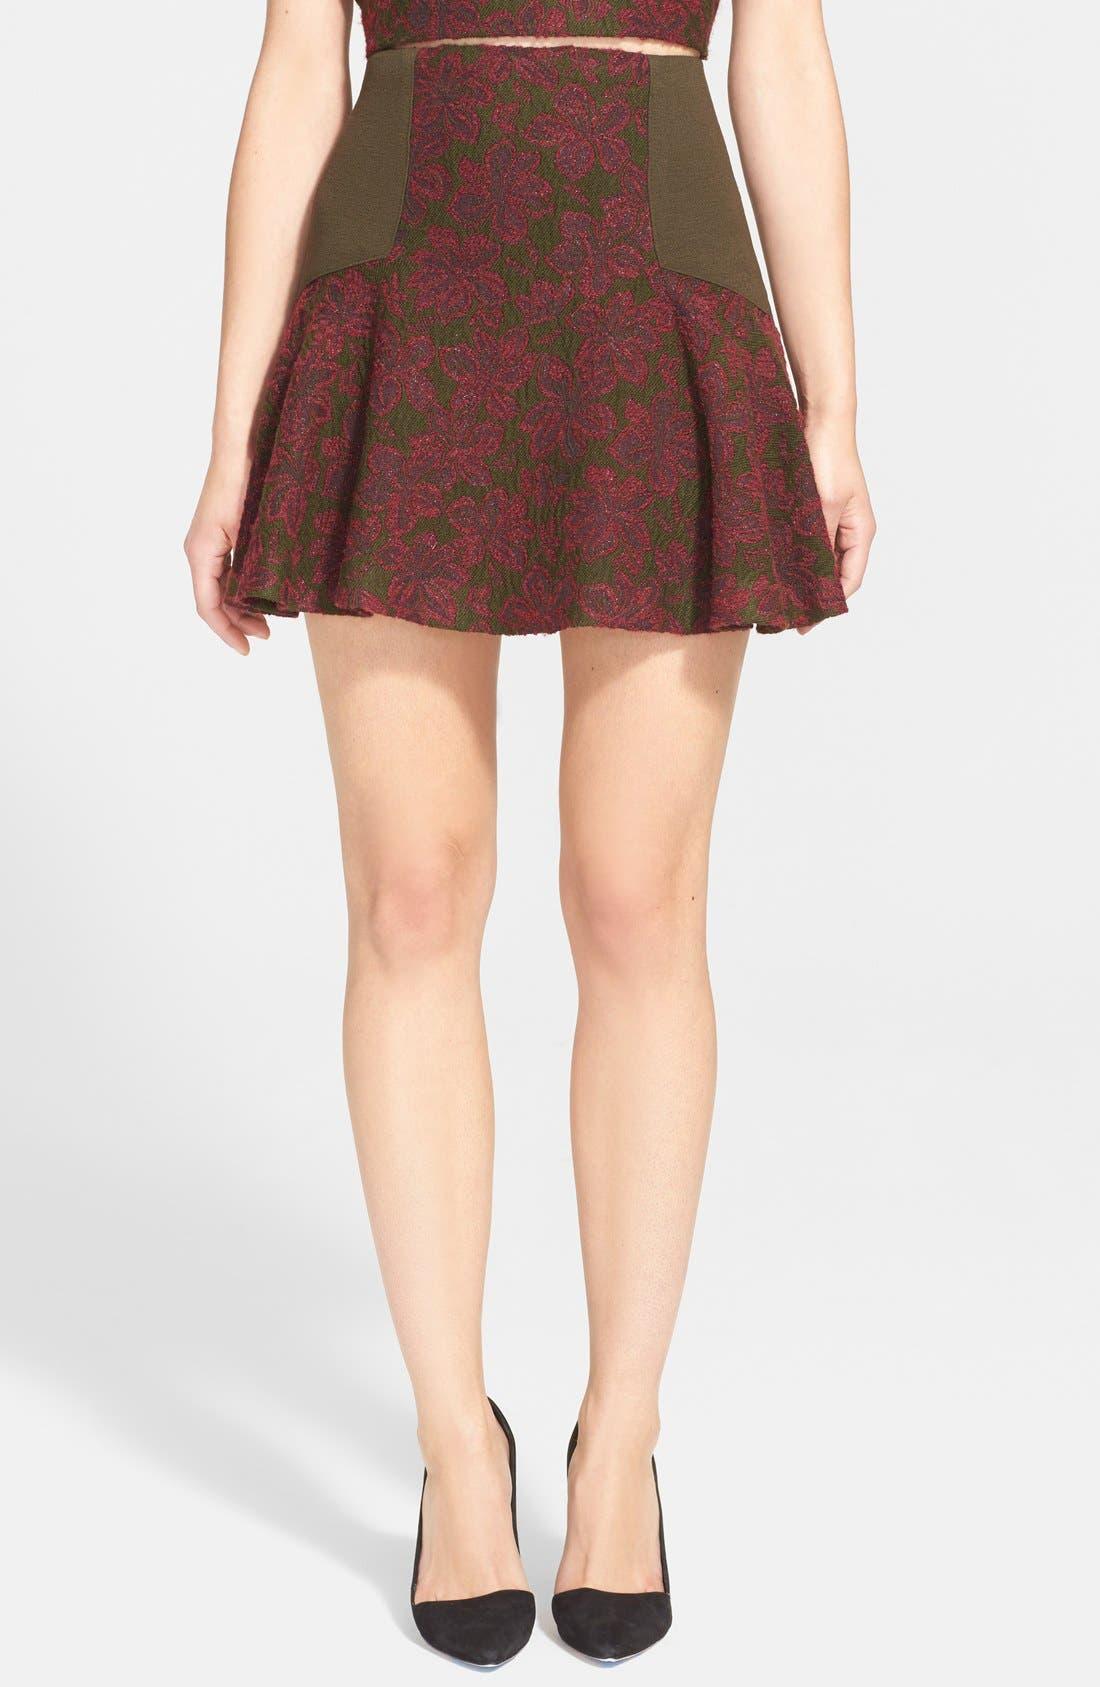 Alternate Image 1 Selected - Alice + Olivia 'Elsie' Fit & Flare Skirt